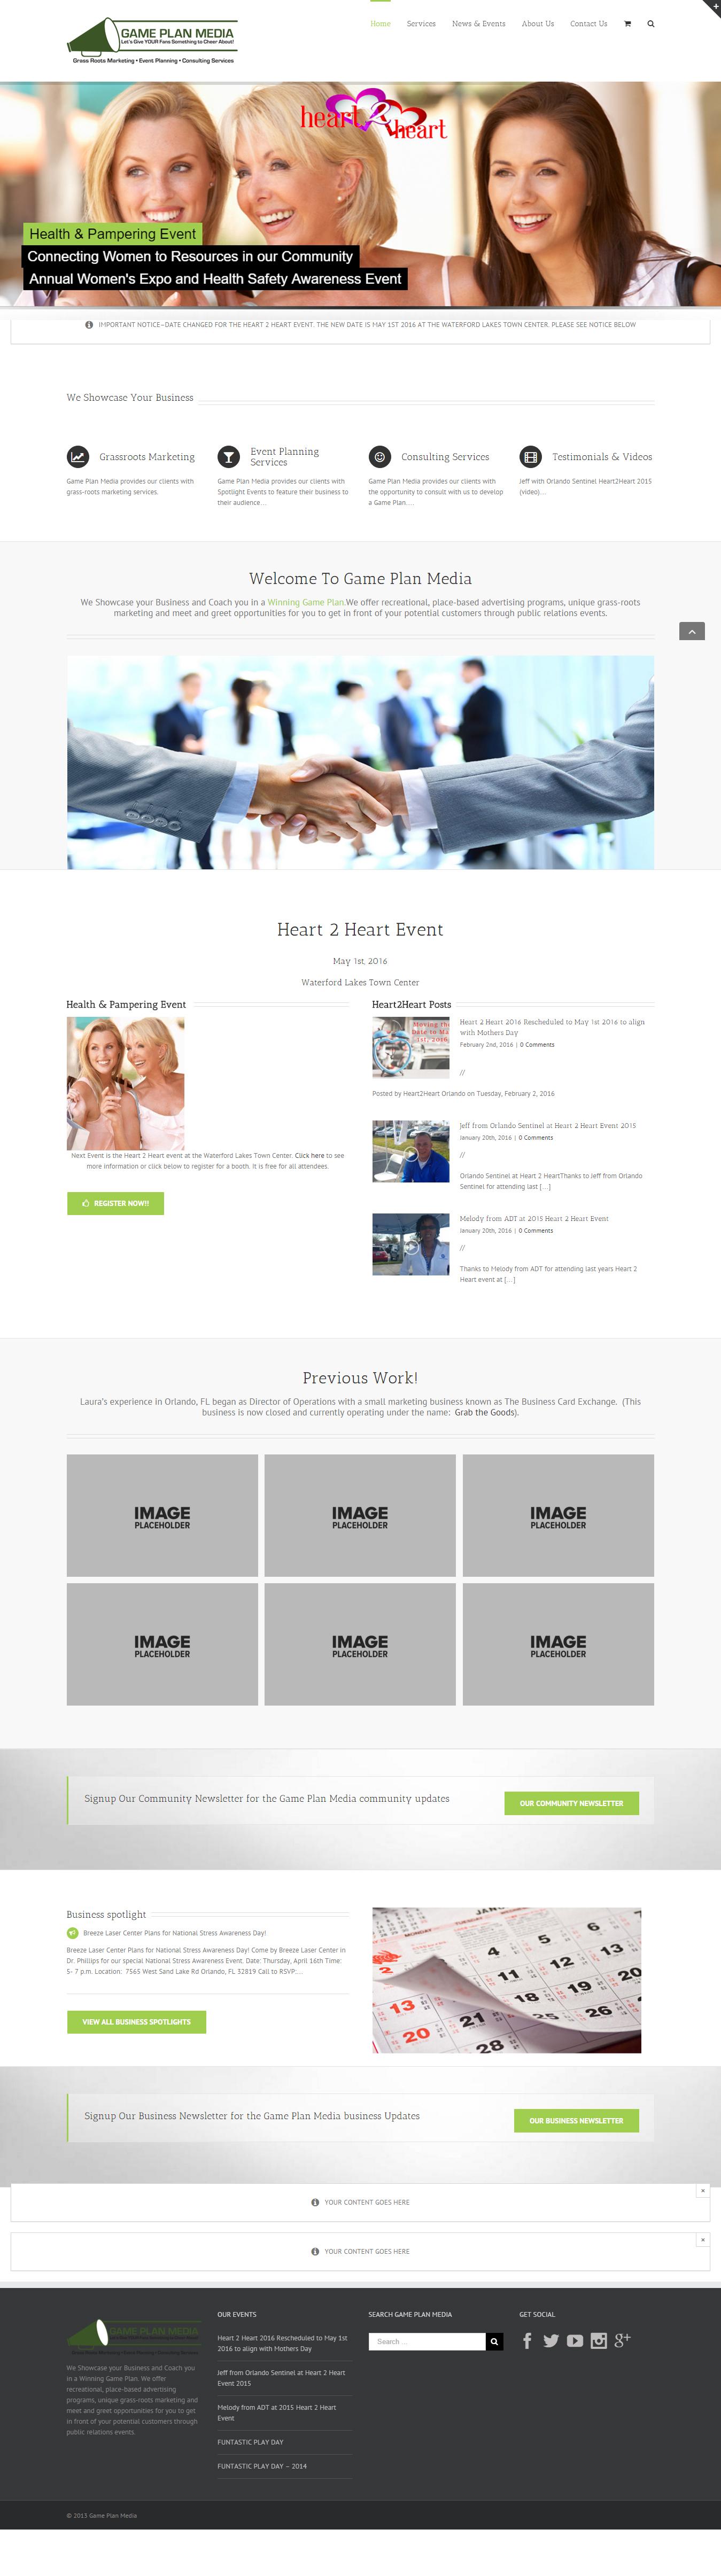 FireShot-Screen-Capture-096-Game-Plan-Media-Events-gameplanmediaevents_com